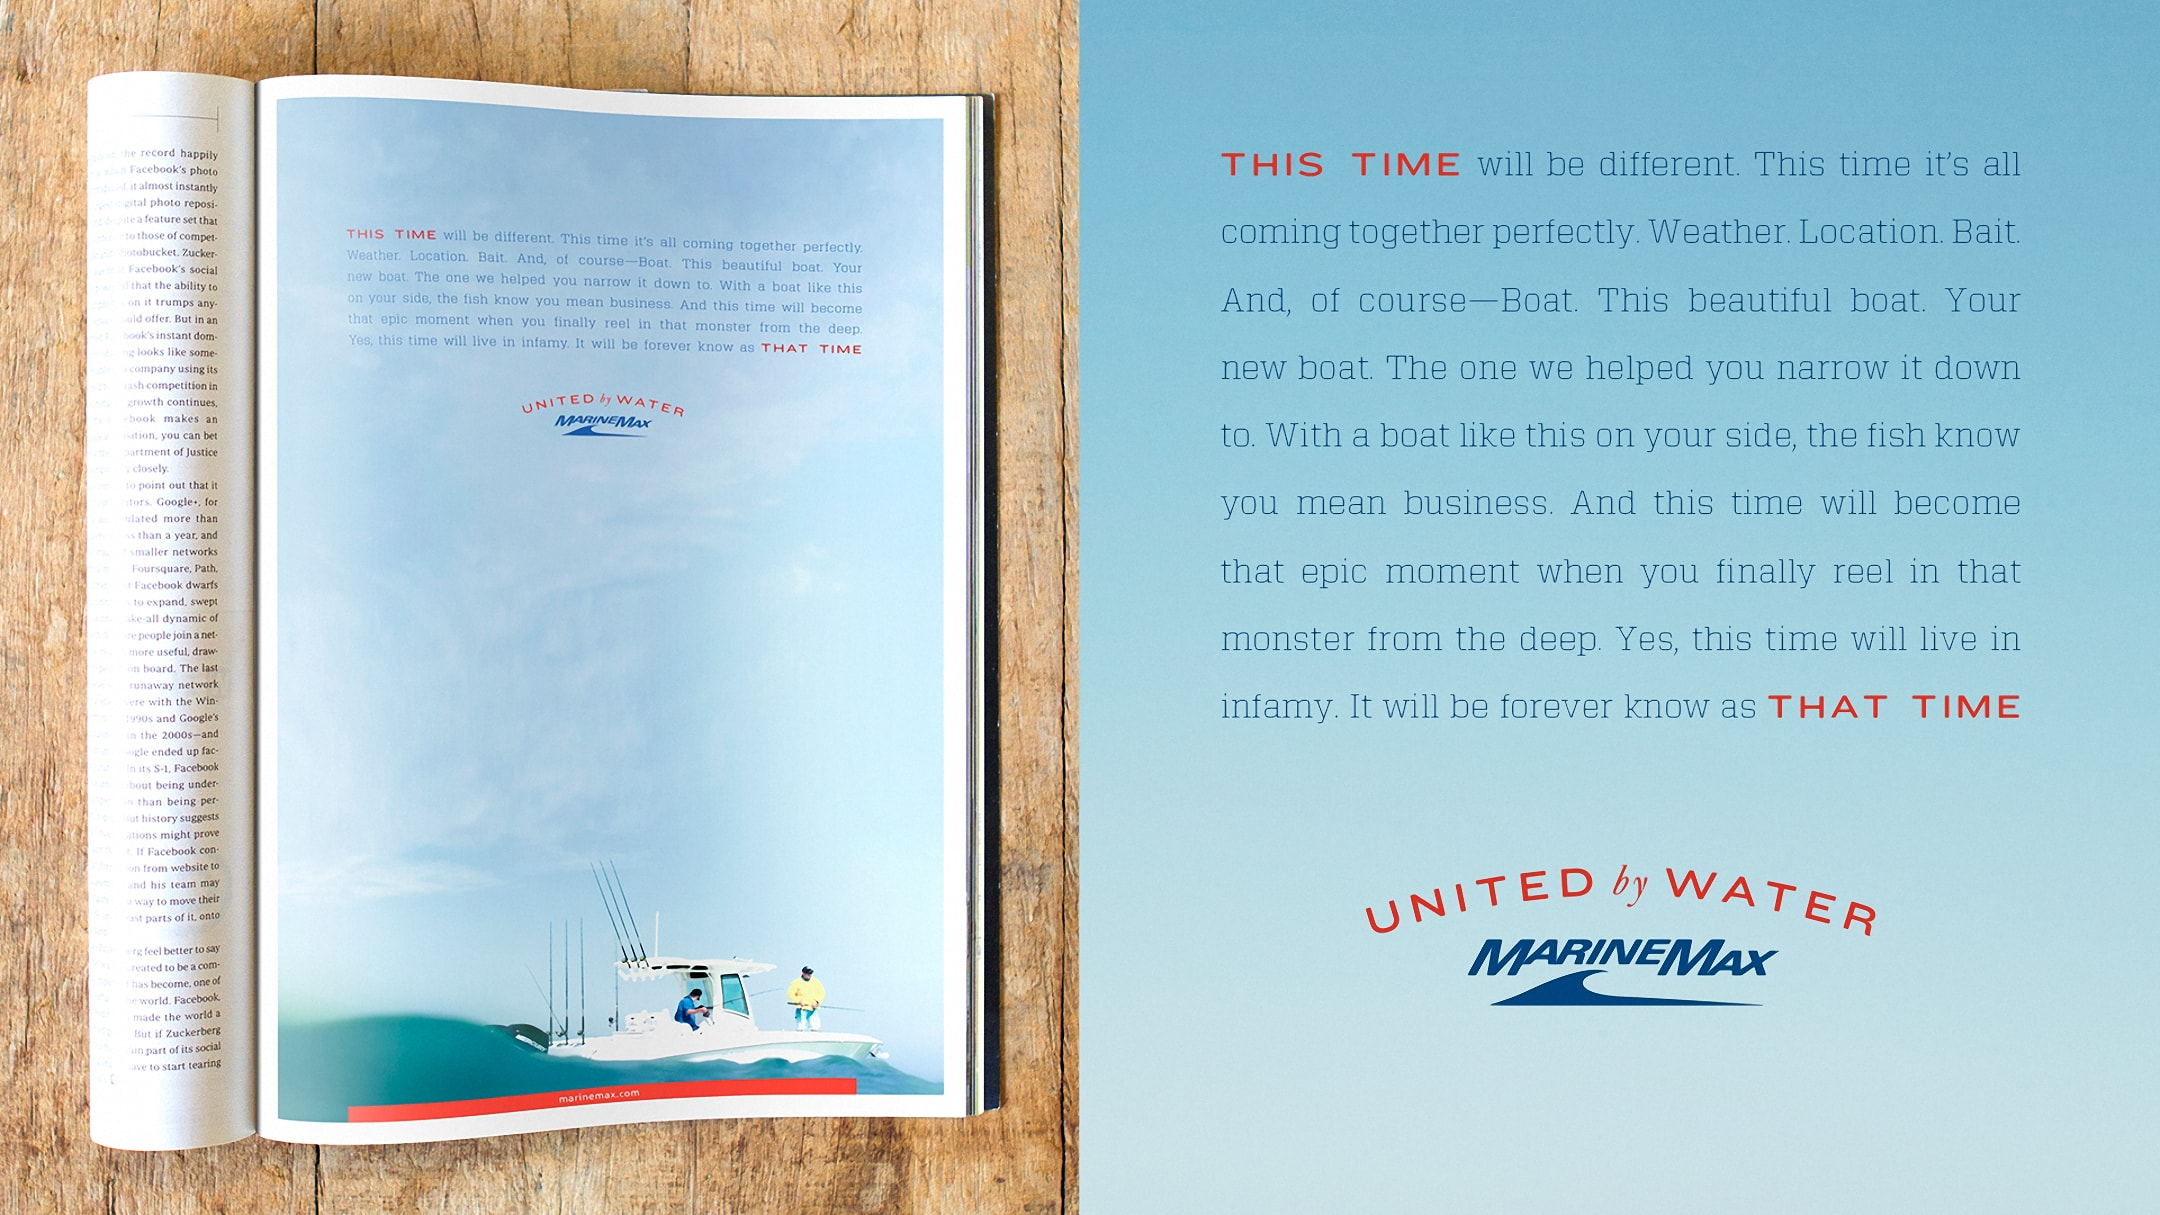 Marine Max print advertisement